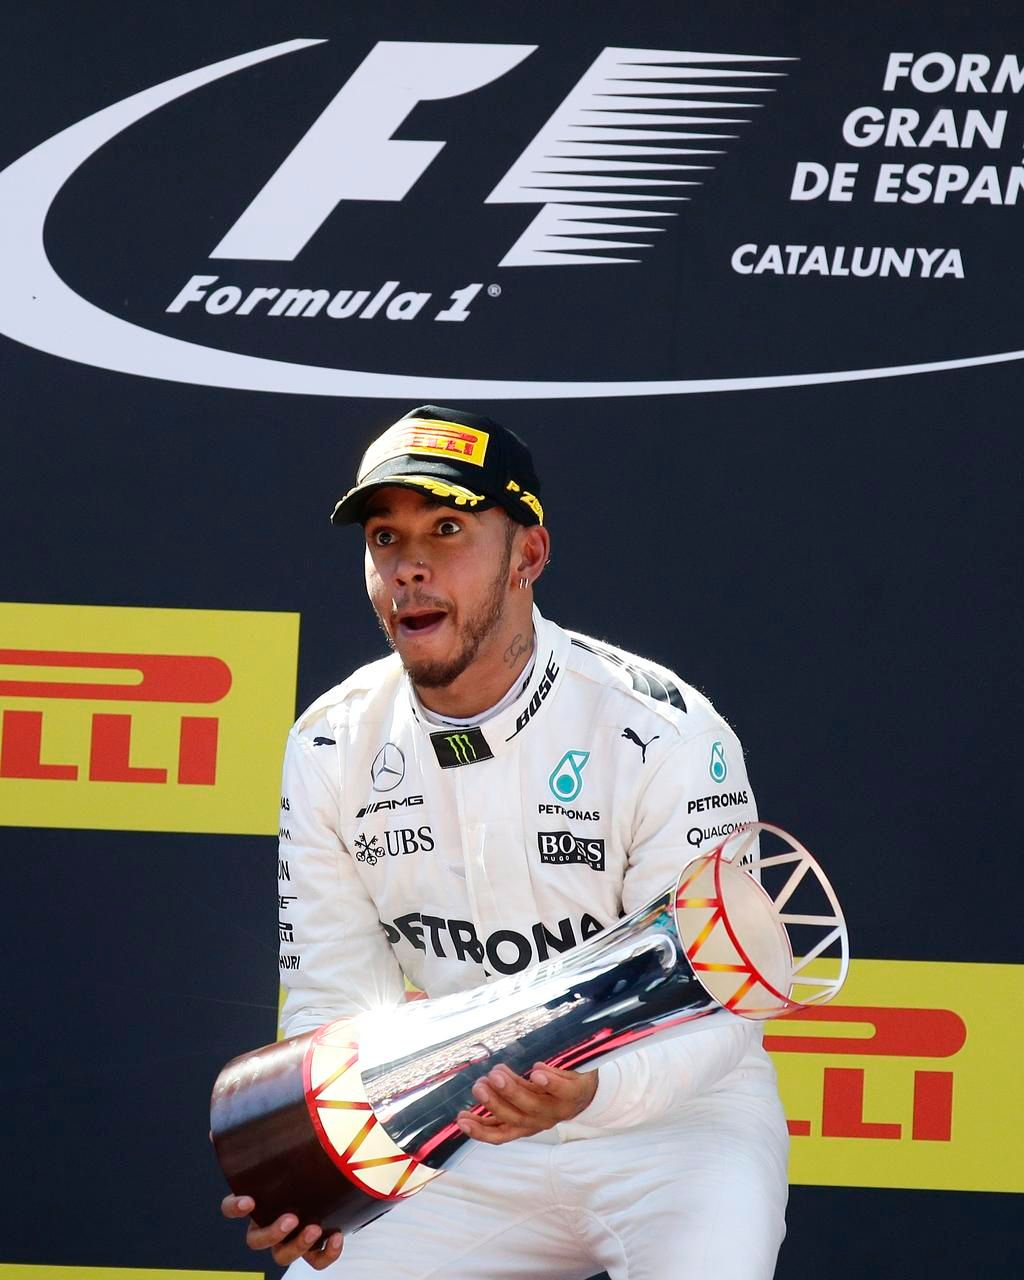 Hamilton se impone en España